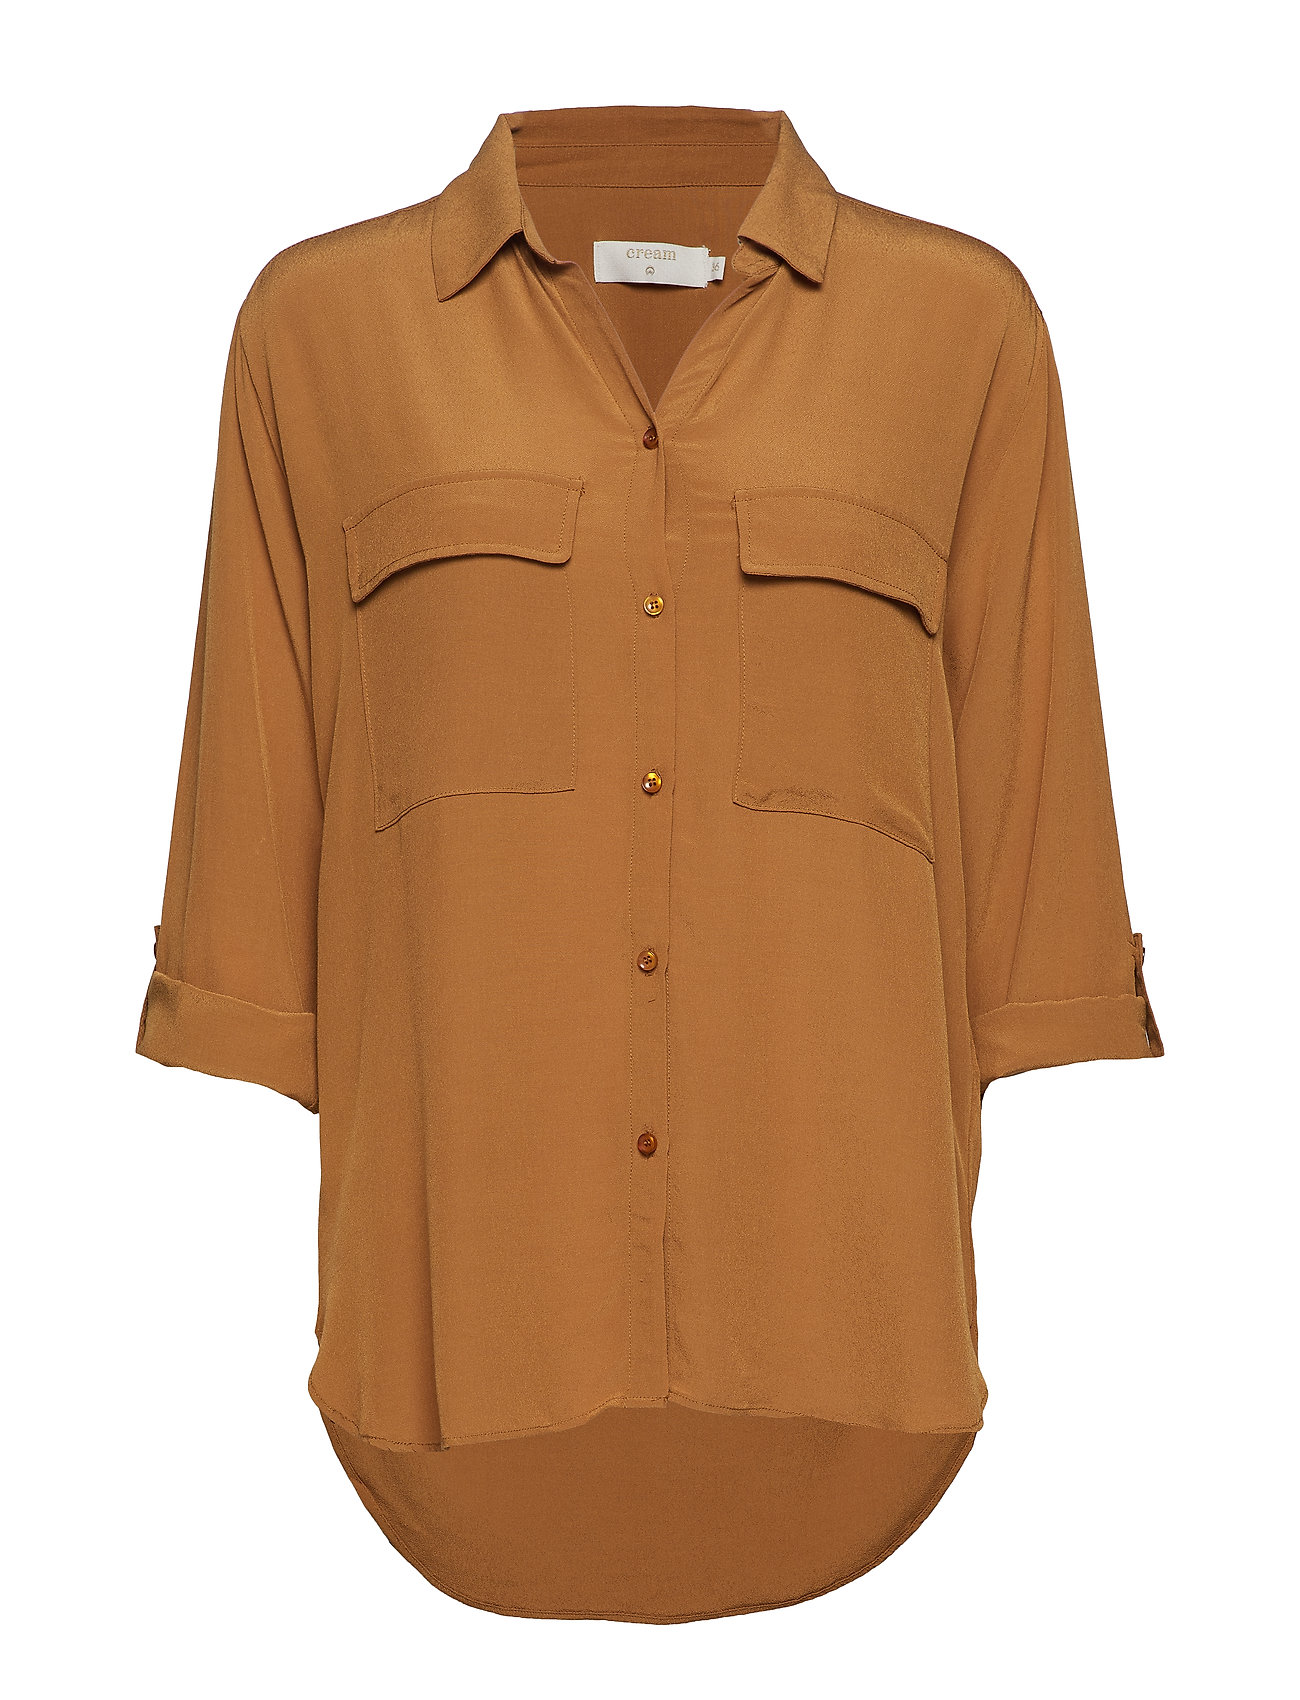 Cream Milanie Shirt - BRONZED